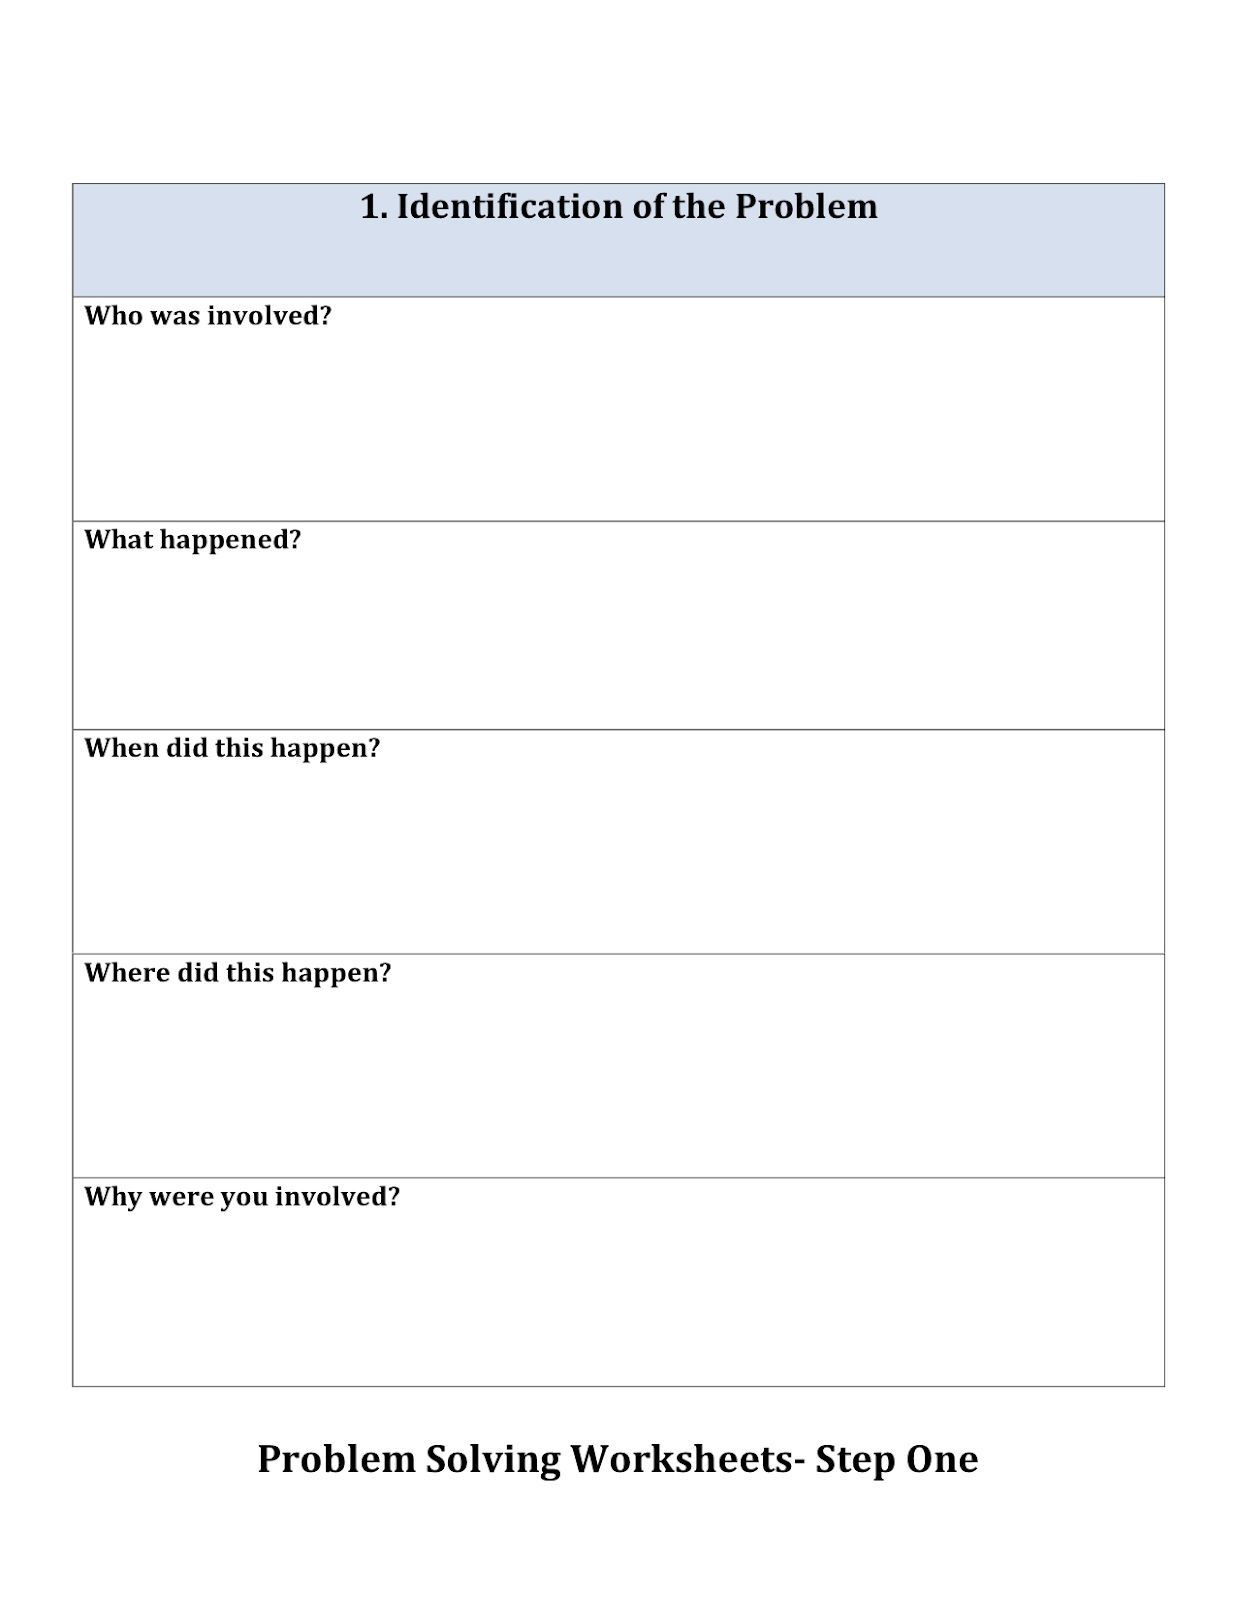 Problem Solving Worksheets 1 1 236 1 600 Pixels